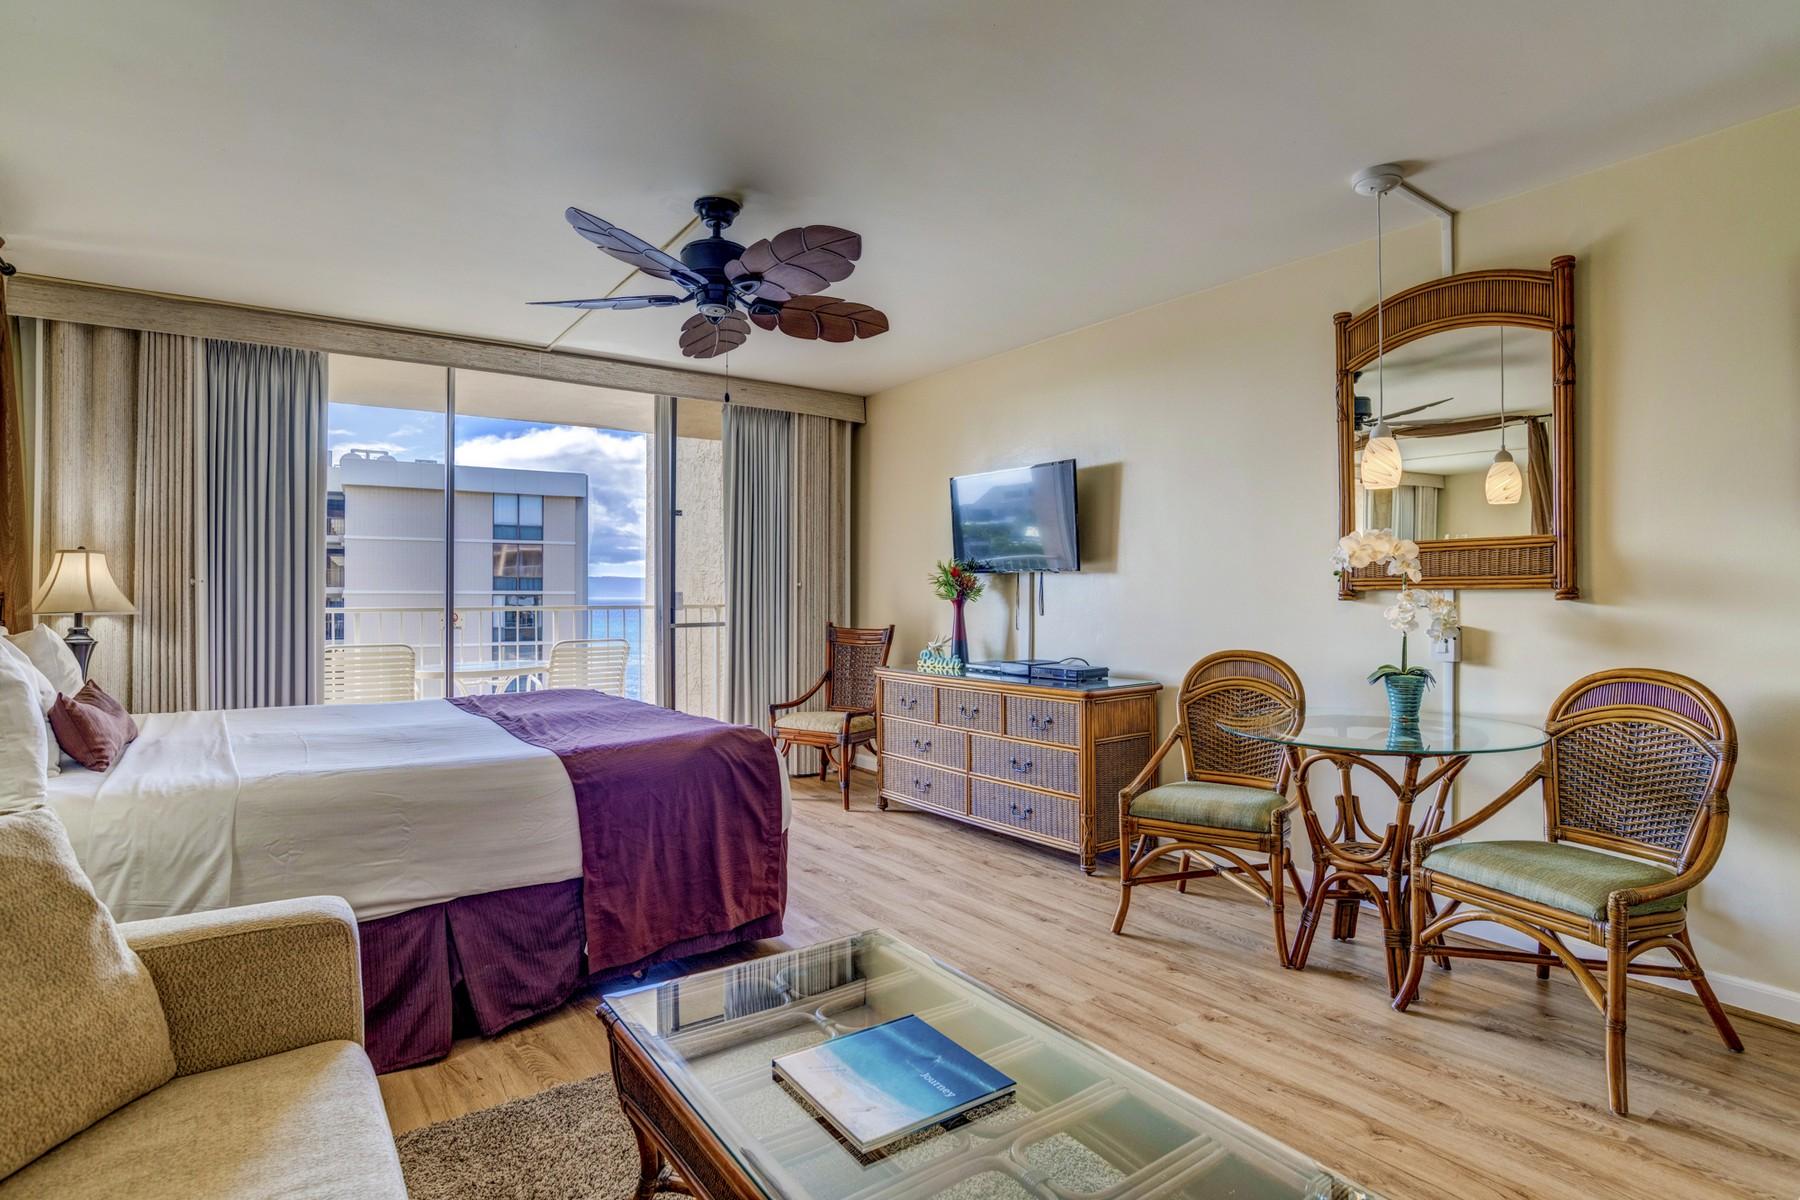 Condominiums for Sale at Top of its Class 4365 Lower Honoapiilani Rd, Royal Kahana #1018 Kahana, Hawaii 96761 United States